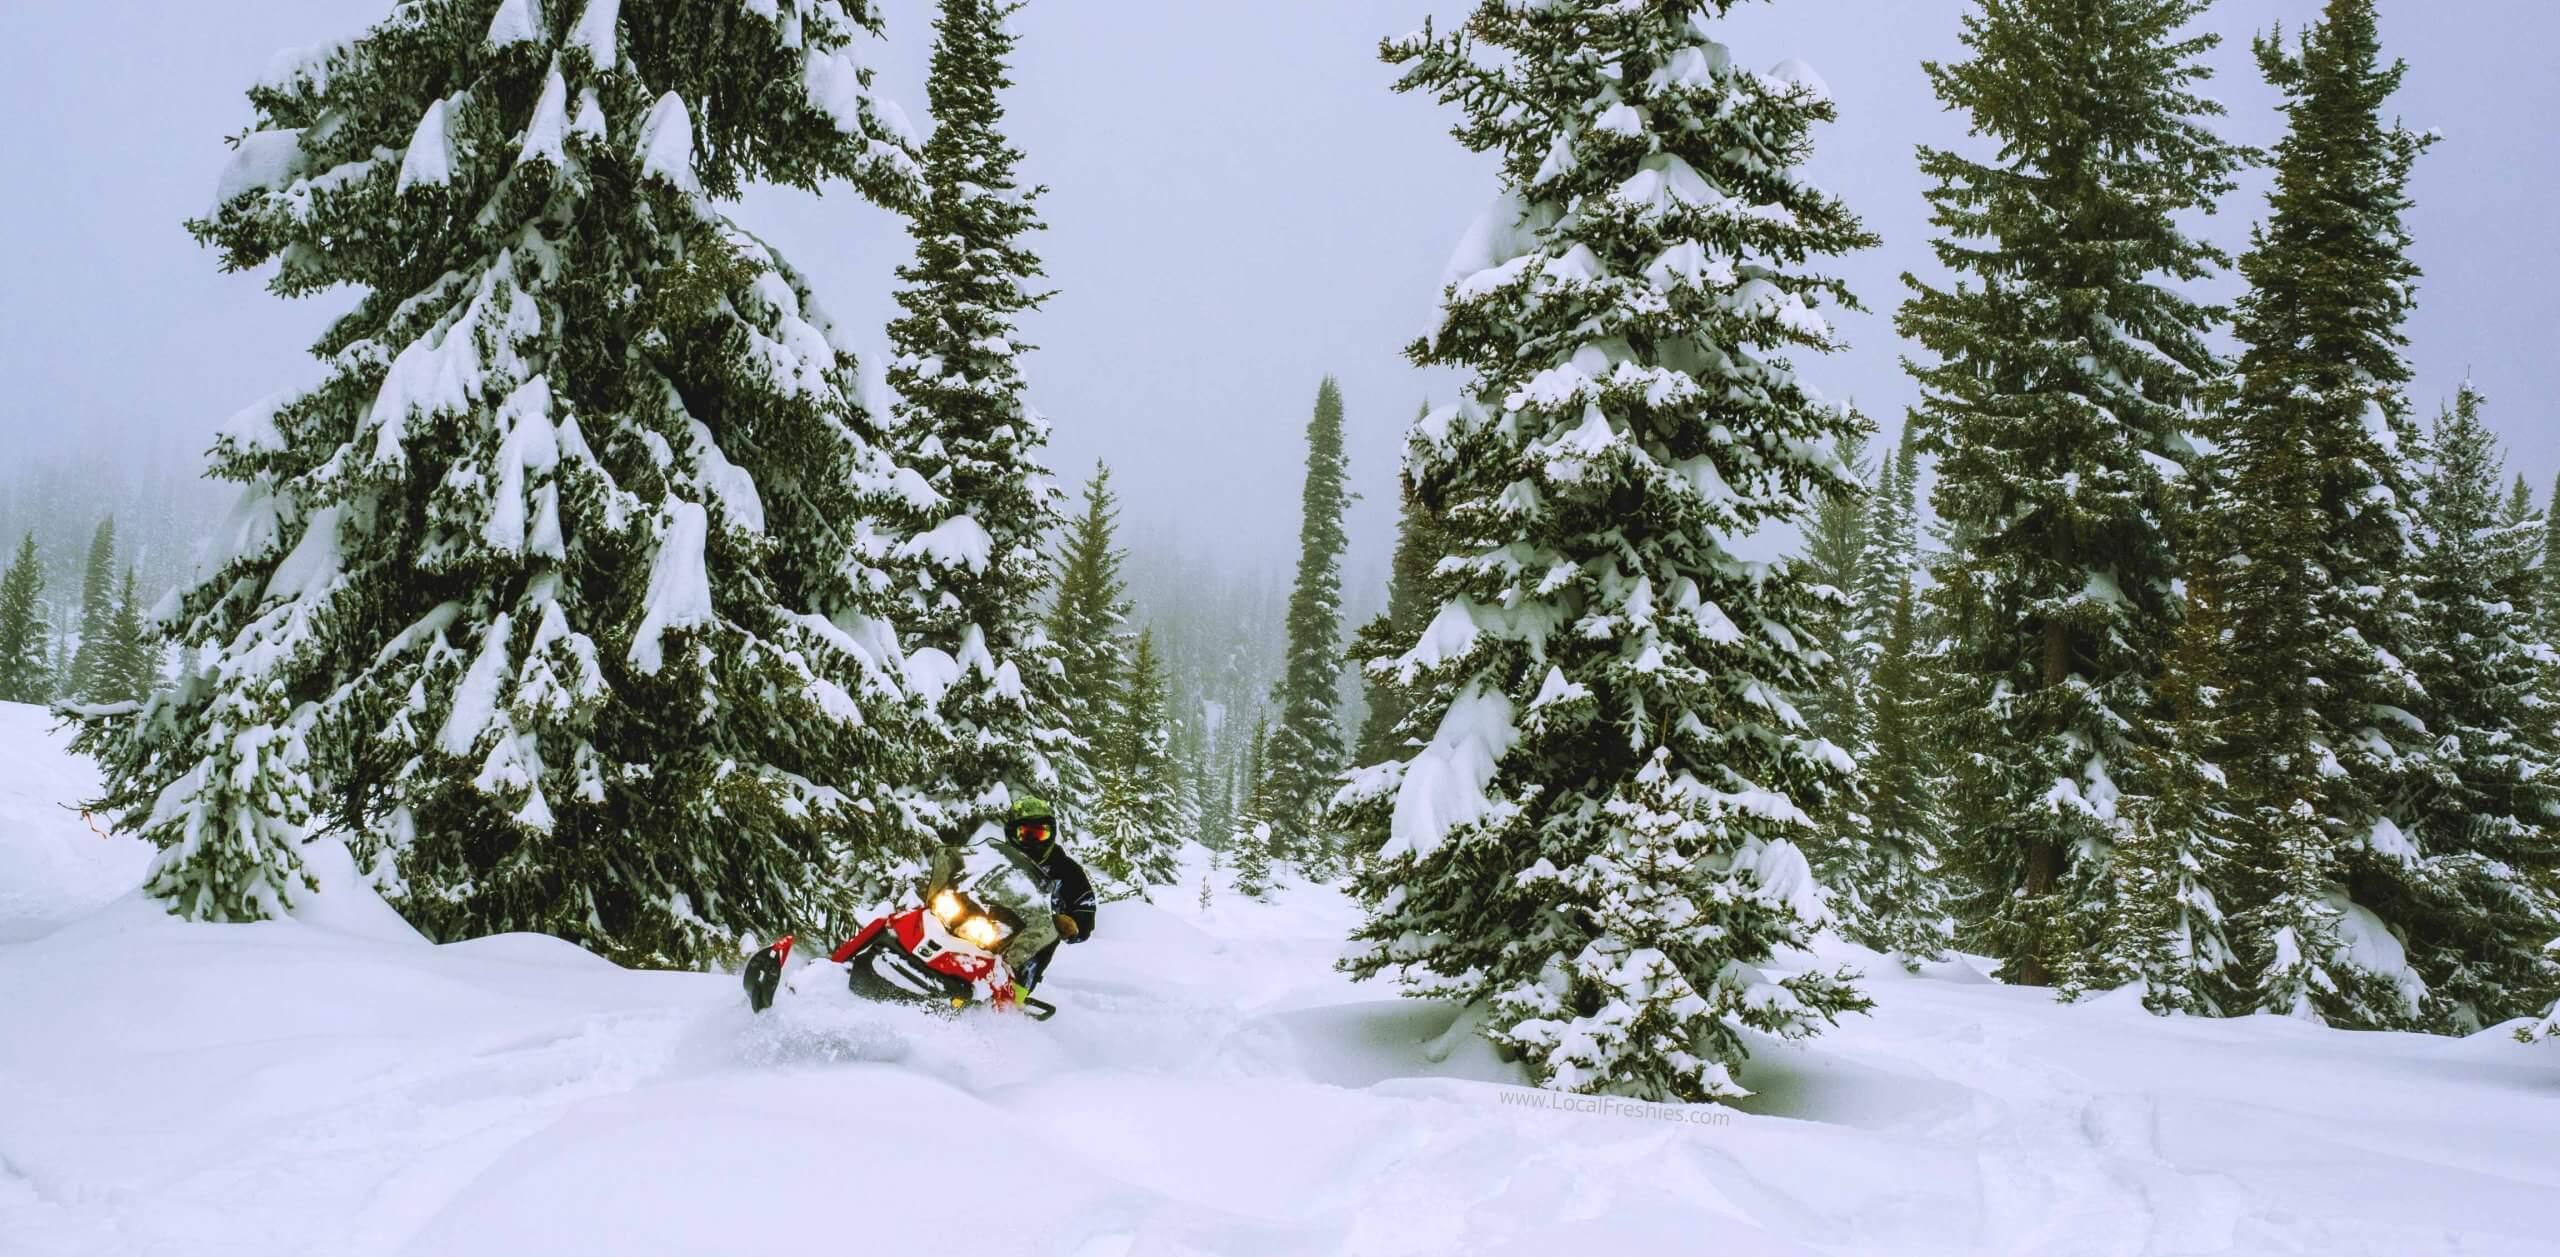 SNOMMOBILER ON SNOWY MOUNTAIN